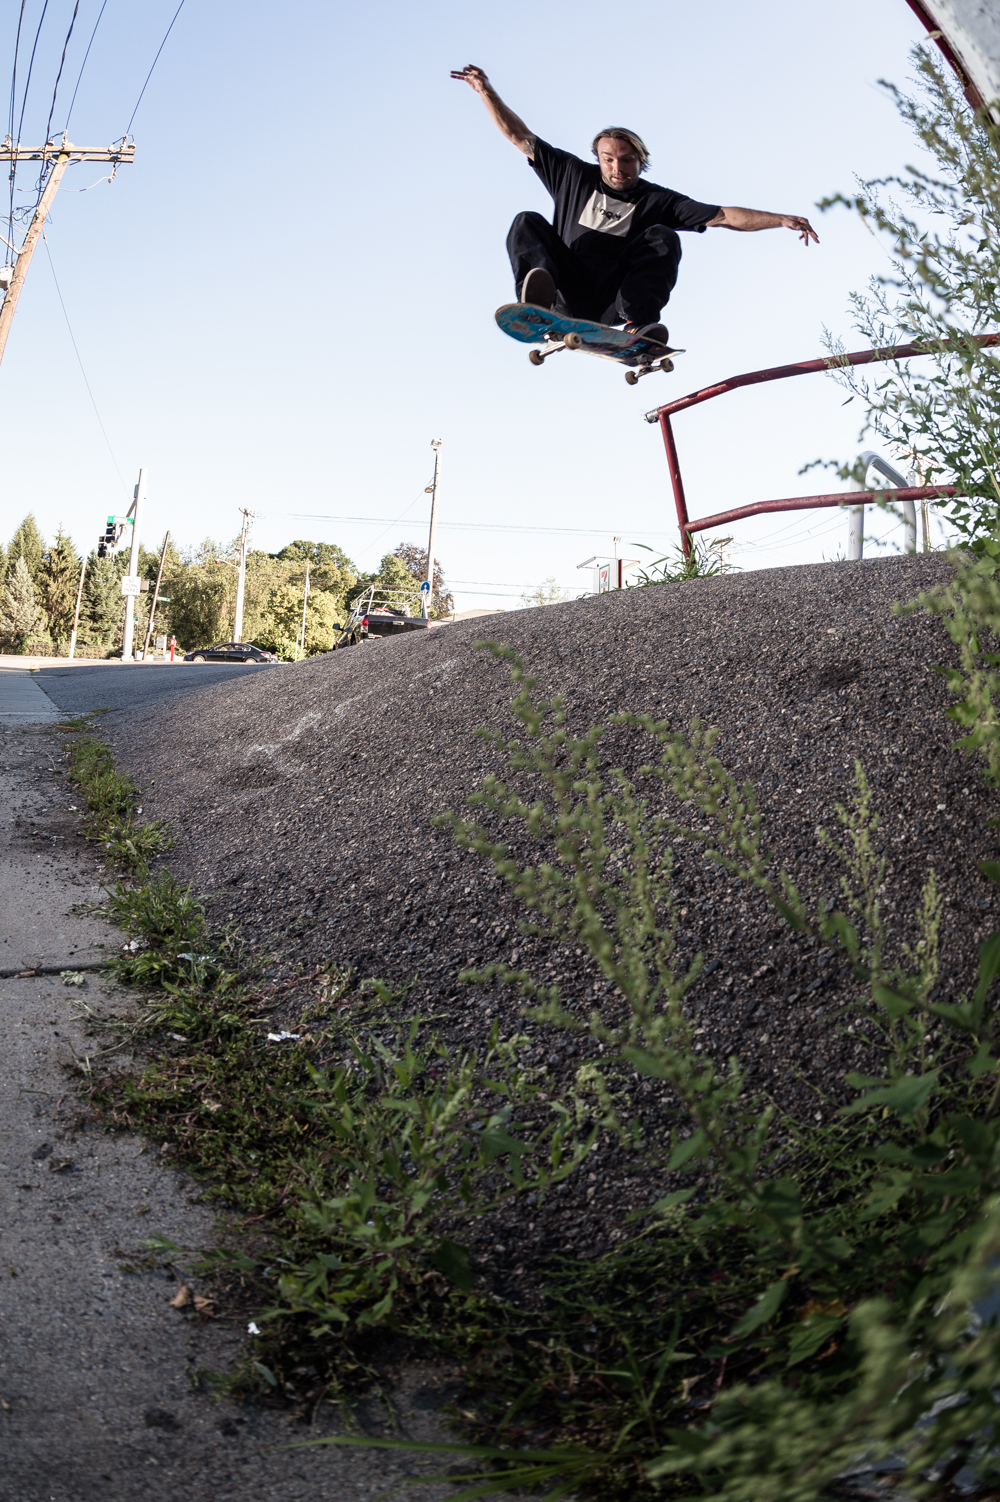 Luke Malaney: Pole Jam / Photo: Collins